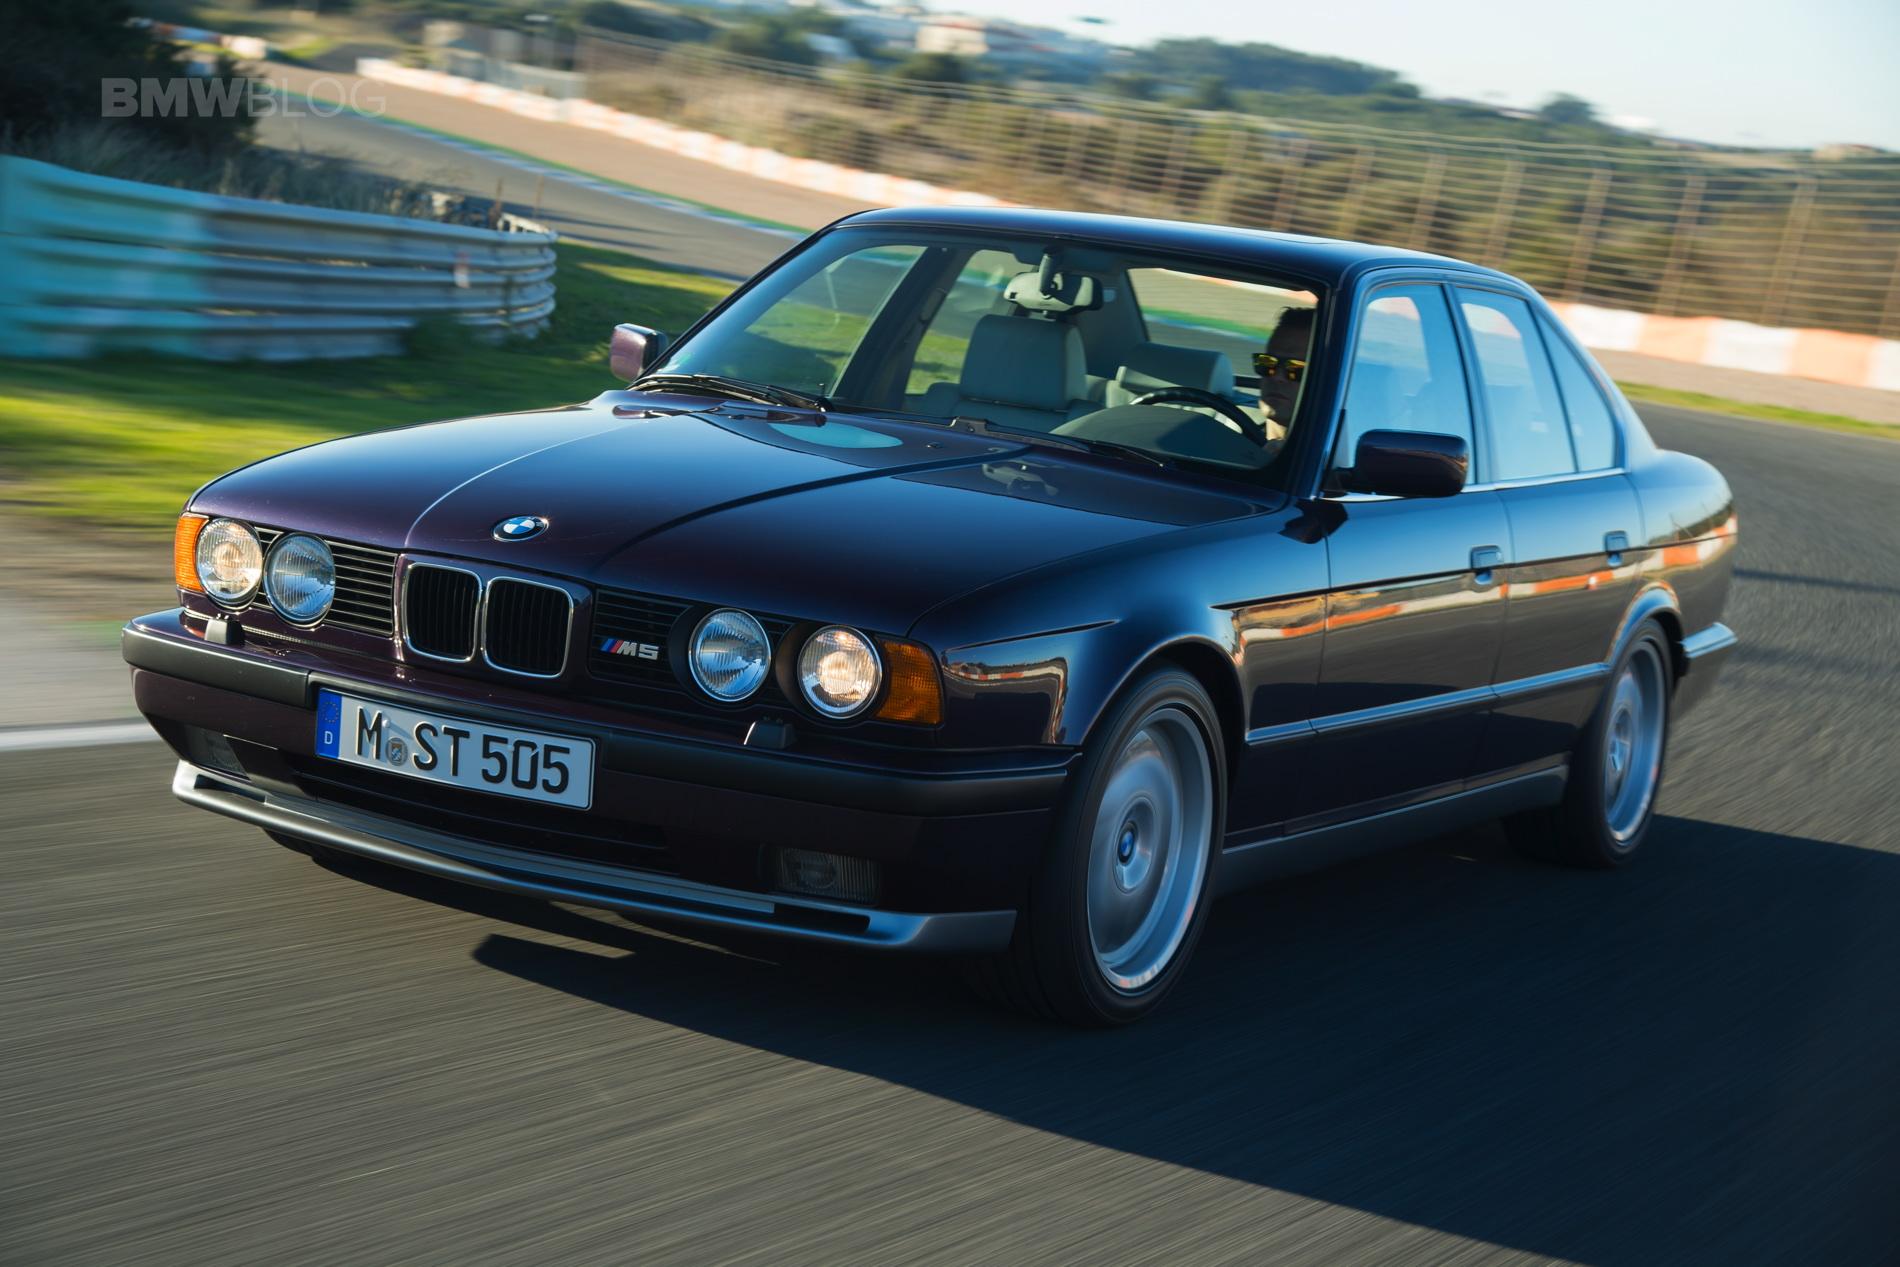 BMW E34 M5 photos 07